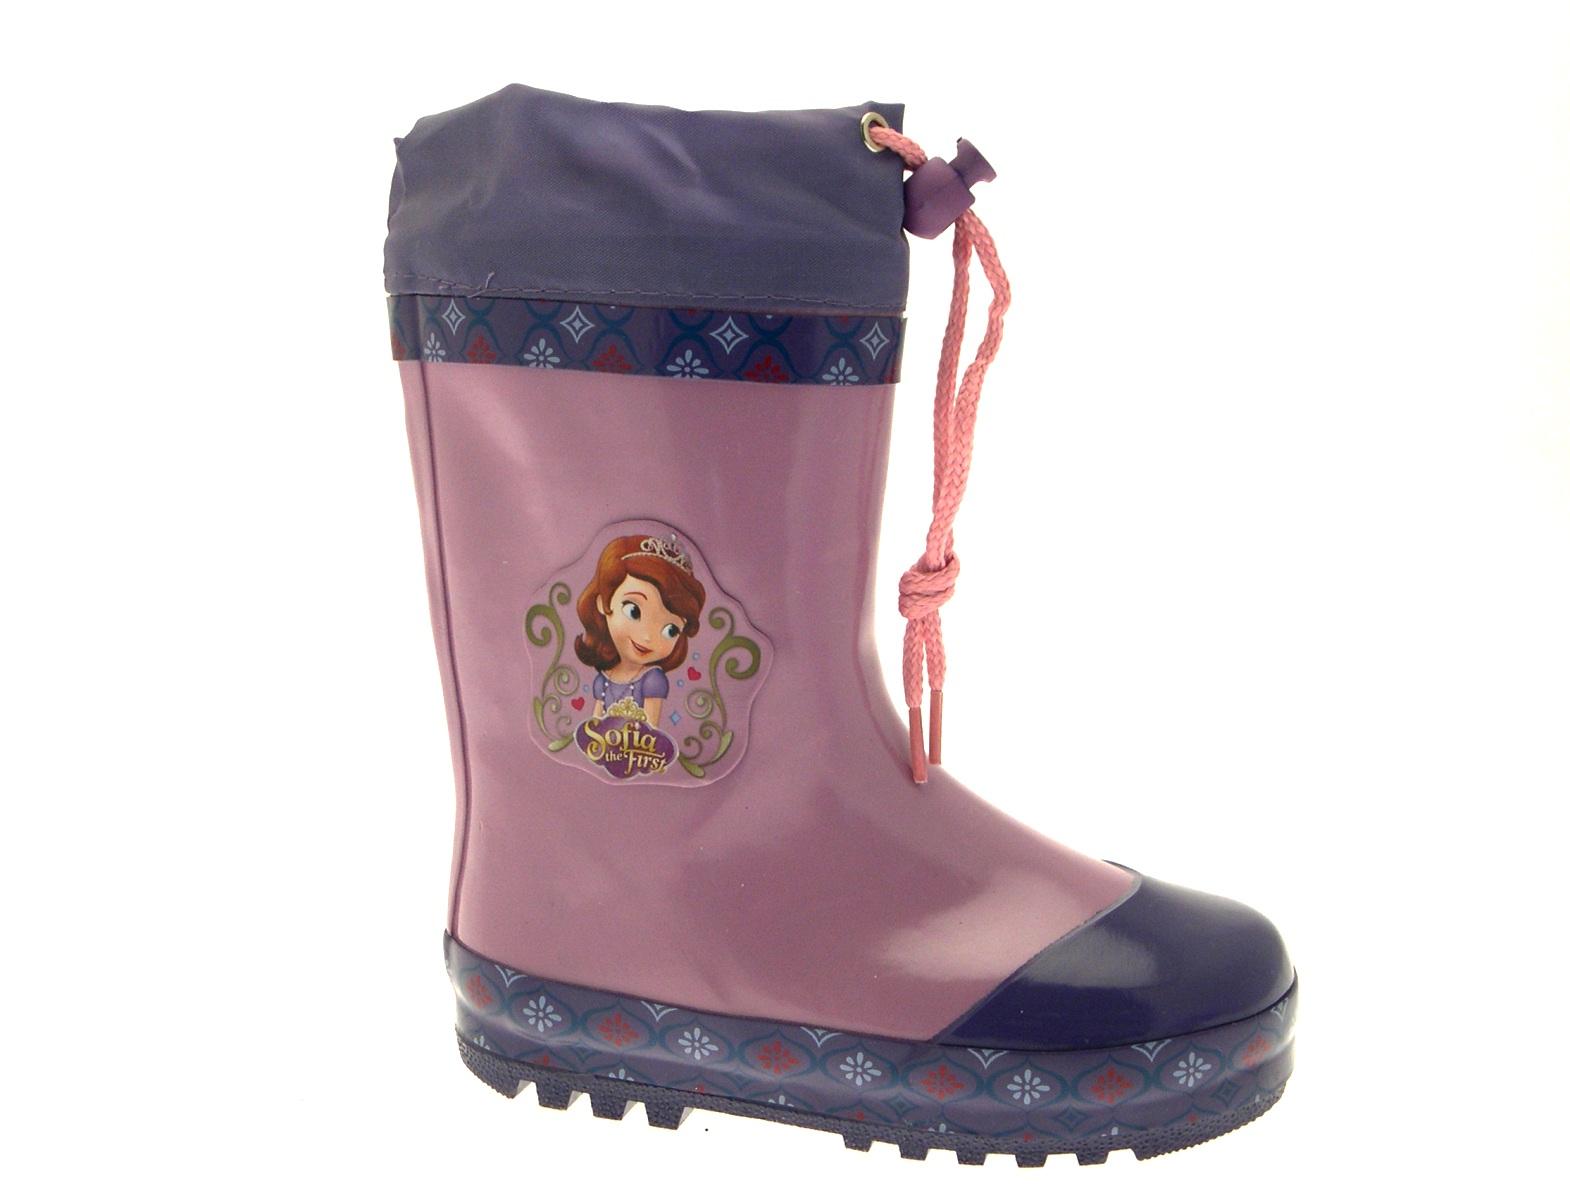 Princess Sofia Rubber Snow Boots Girls Disney Wellingtons